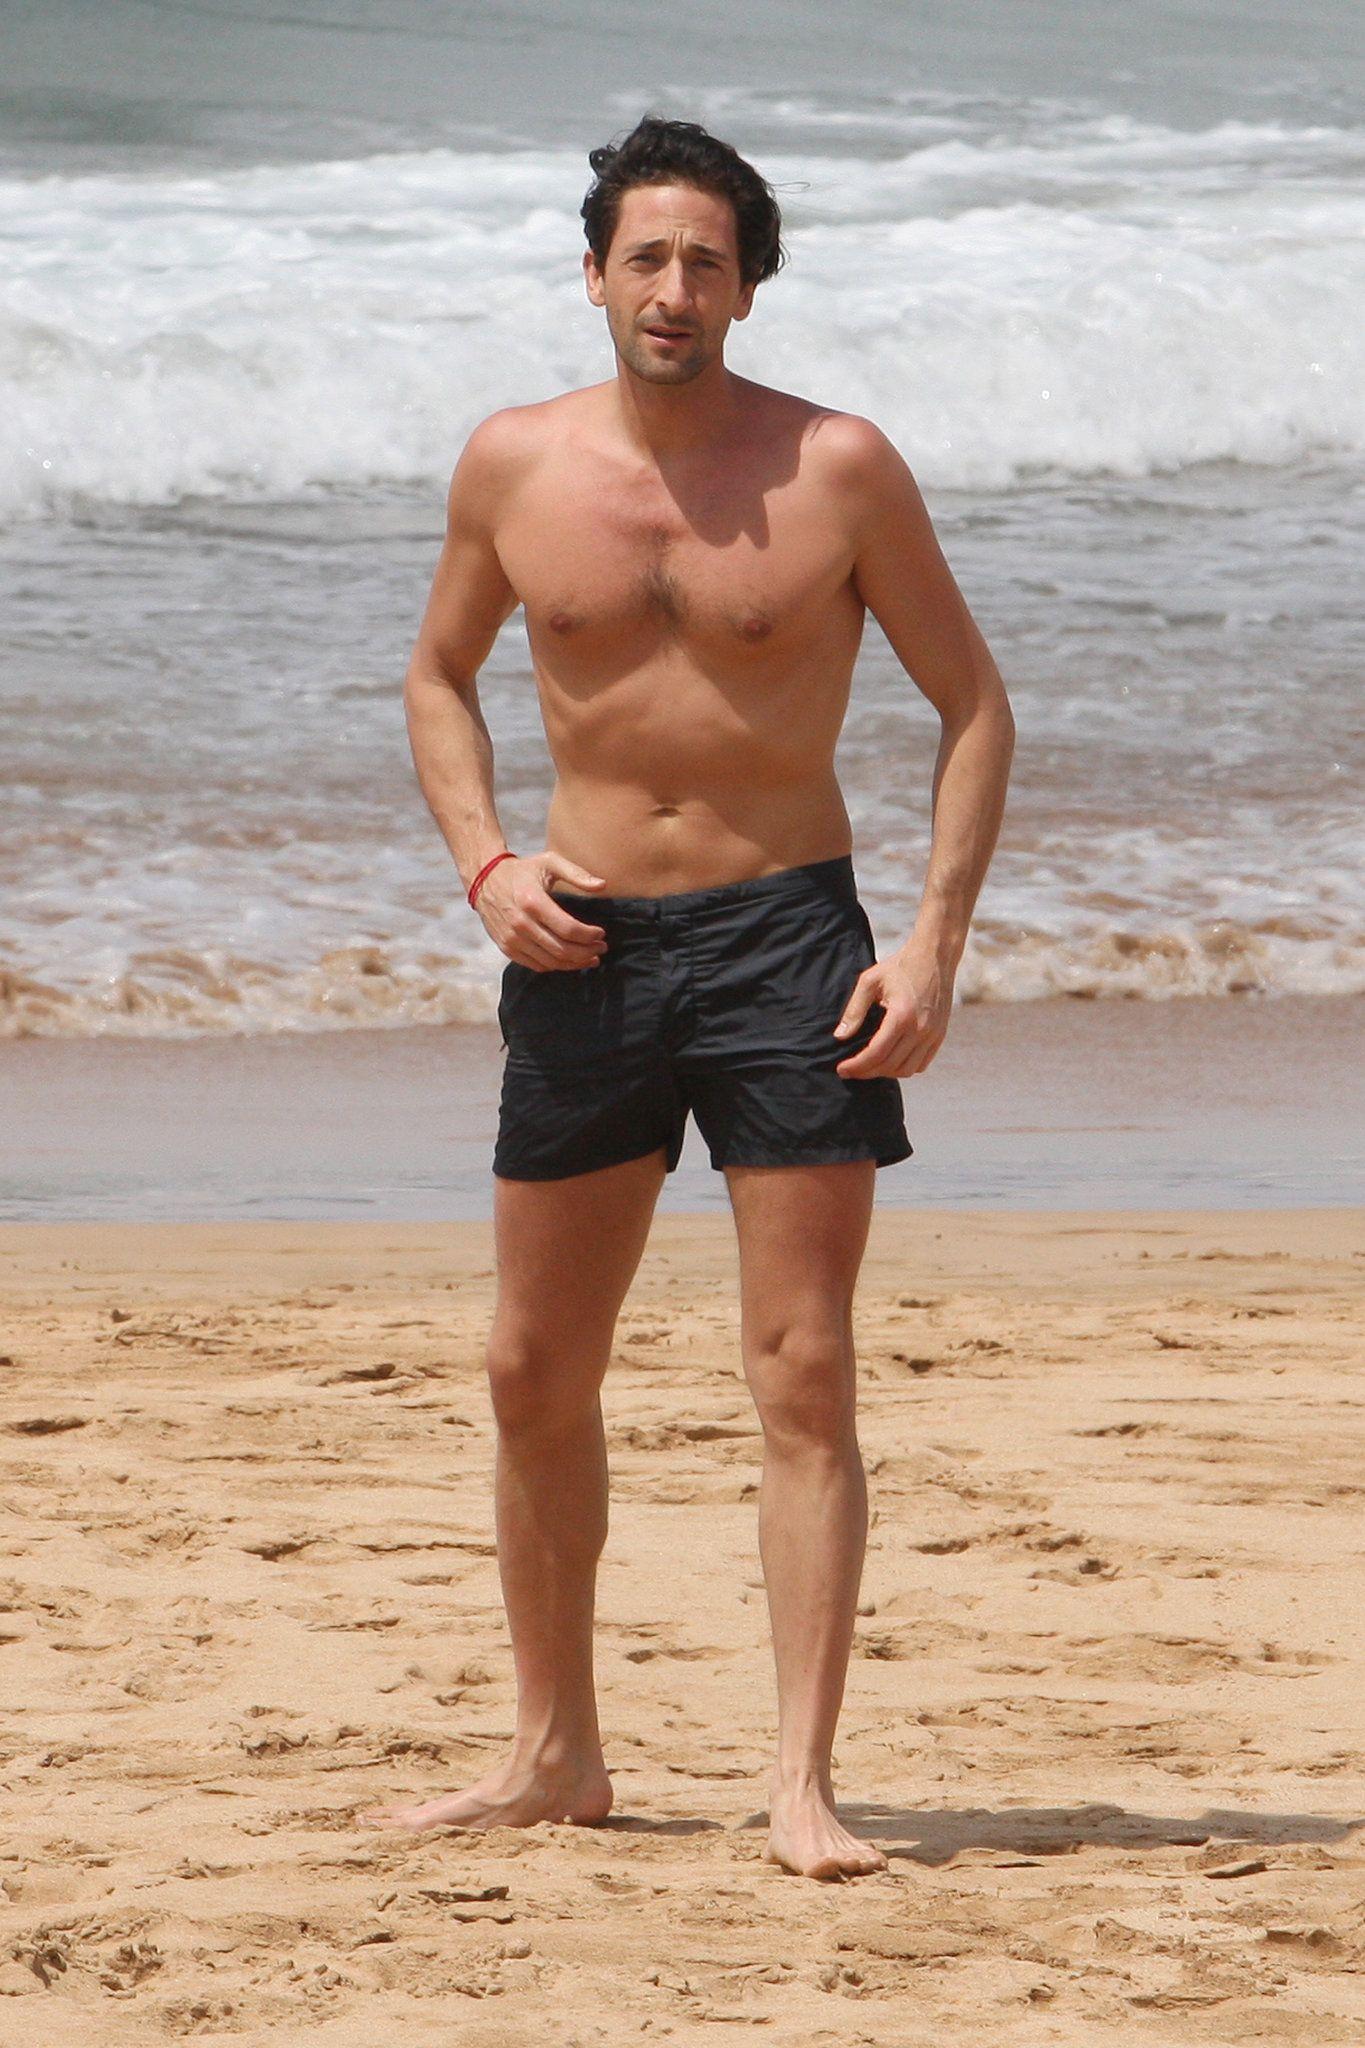 Жара! Звездные красавцы на пляже | WMJ.ru | 2048x1365